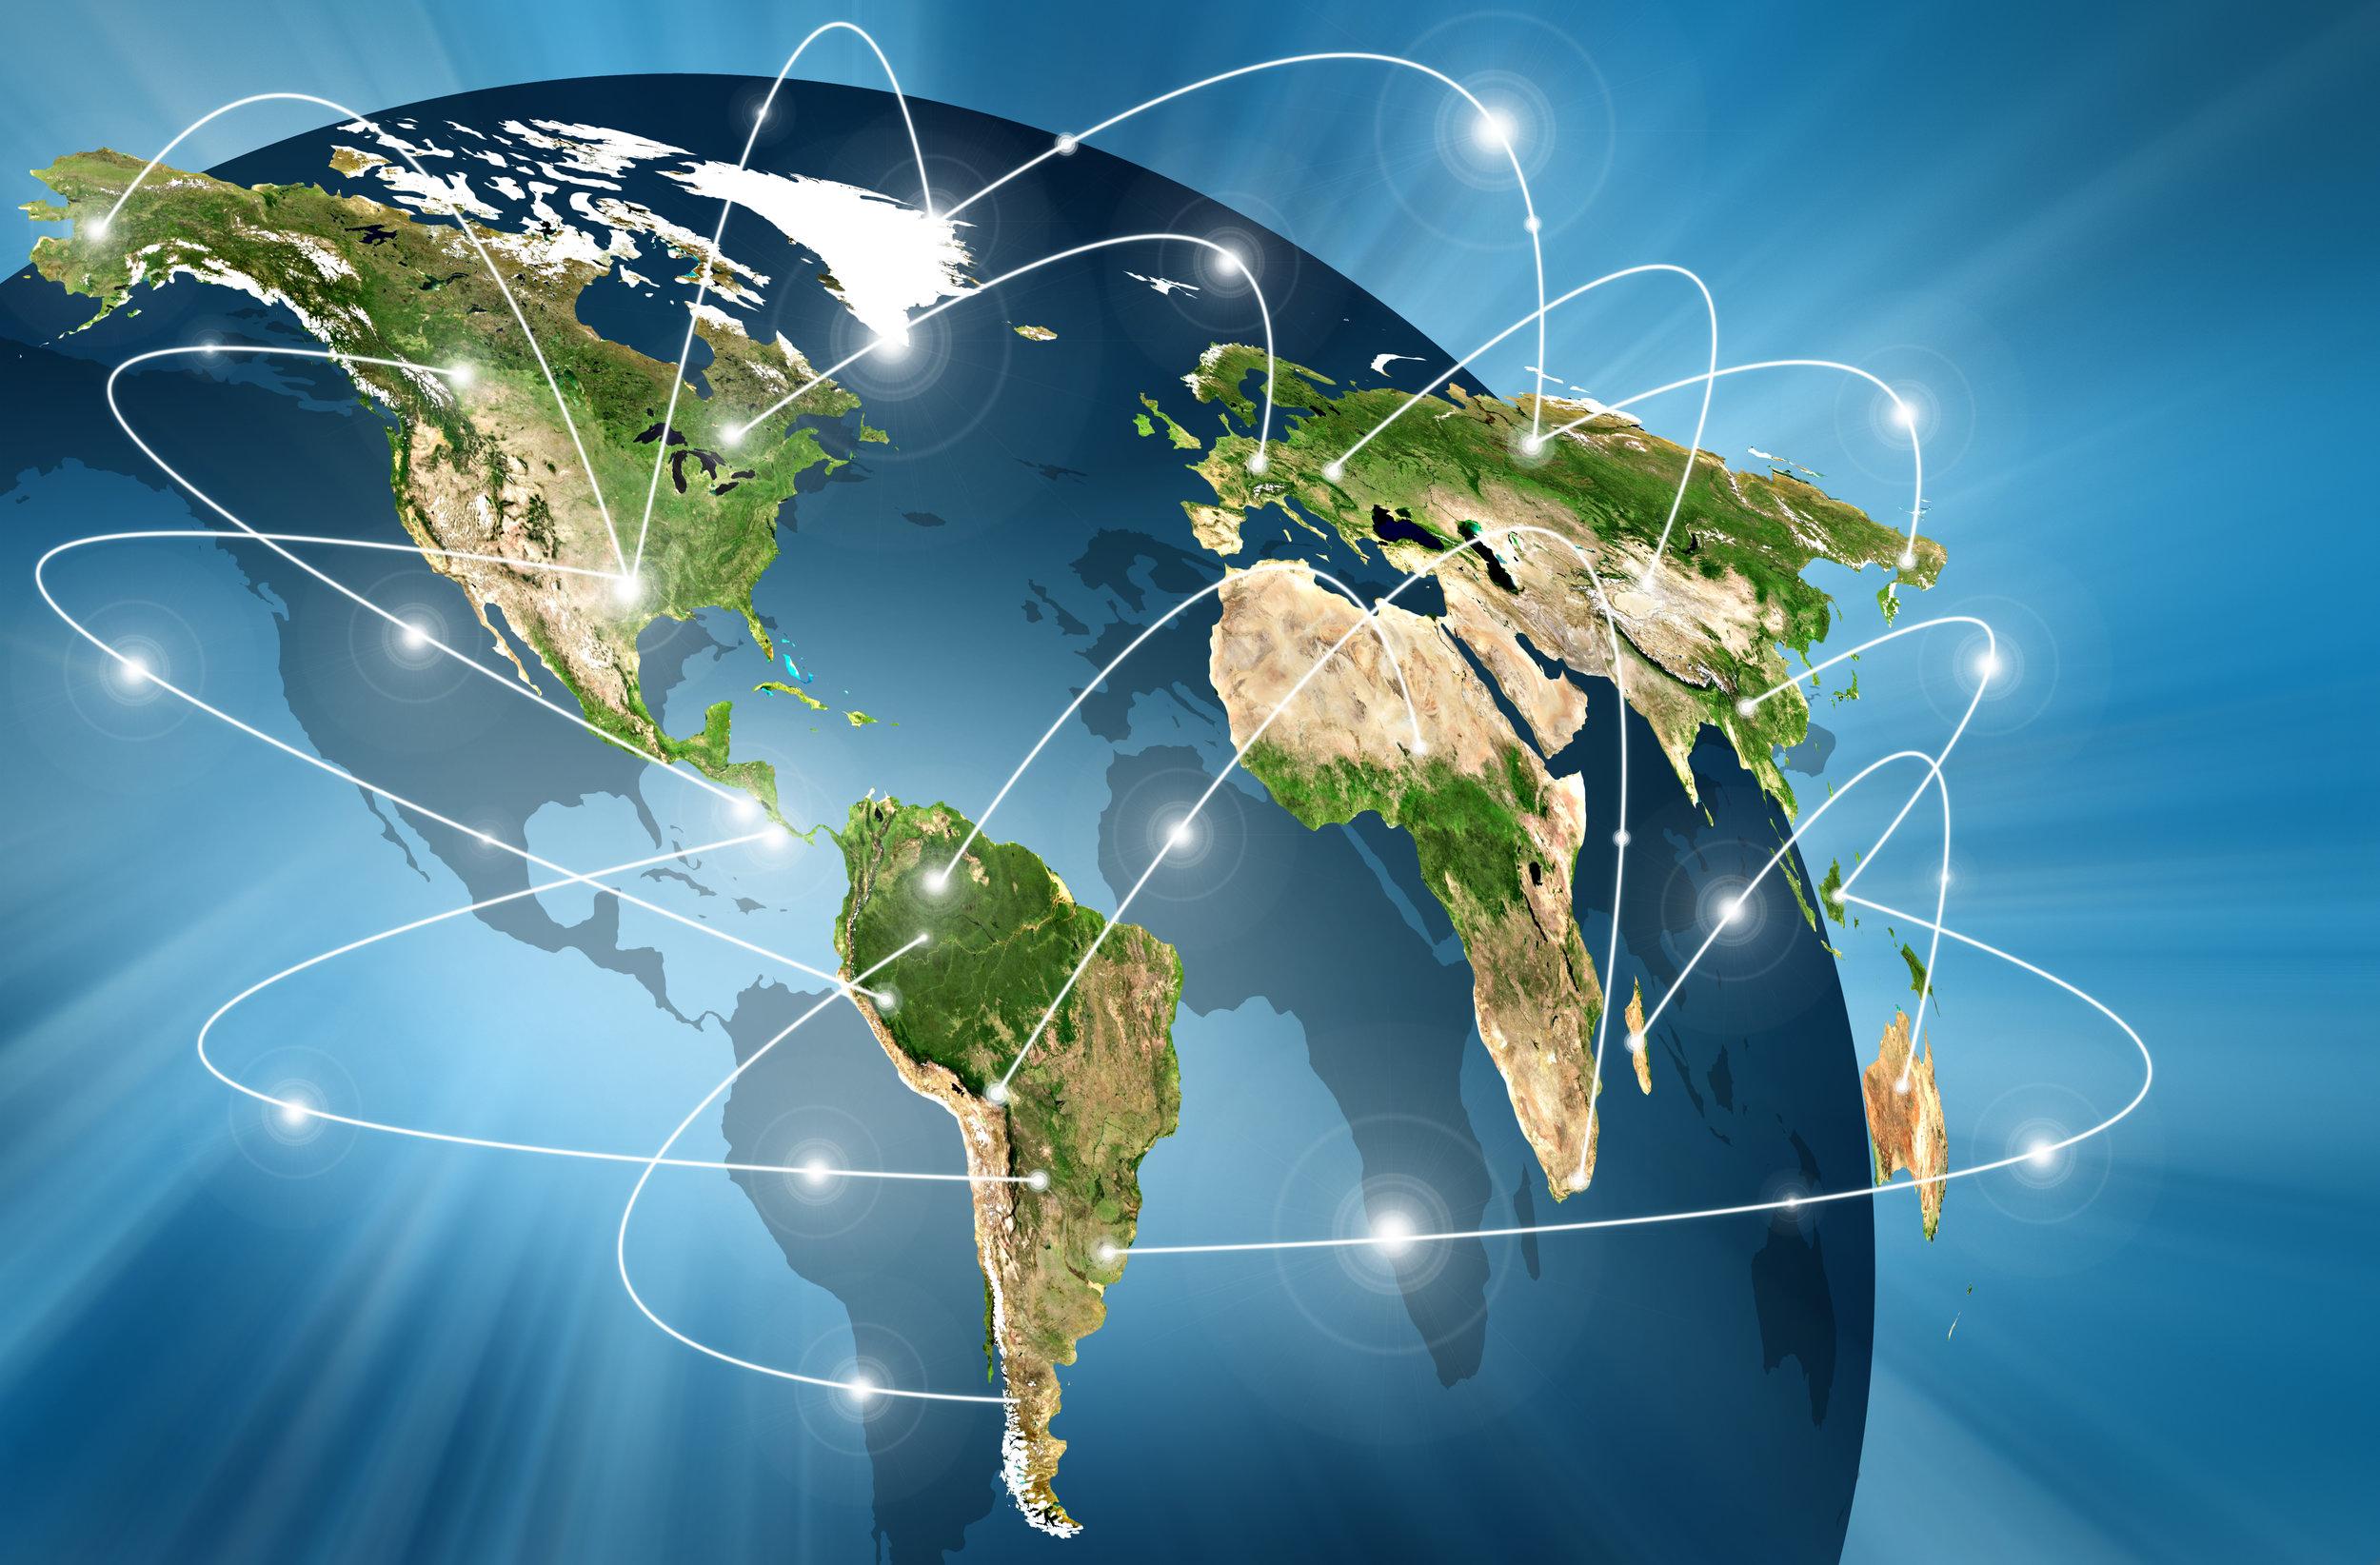 bigstock-world-Map-Best-Concept-of-glo-62830309.jpg